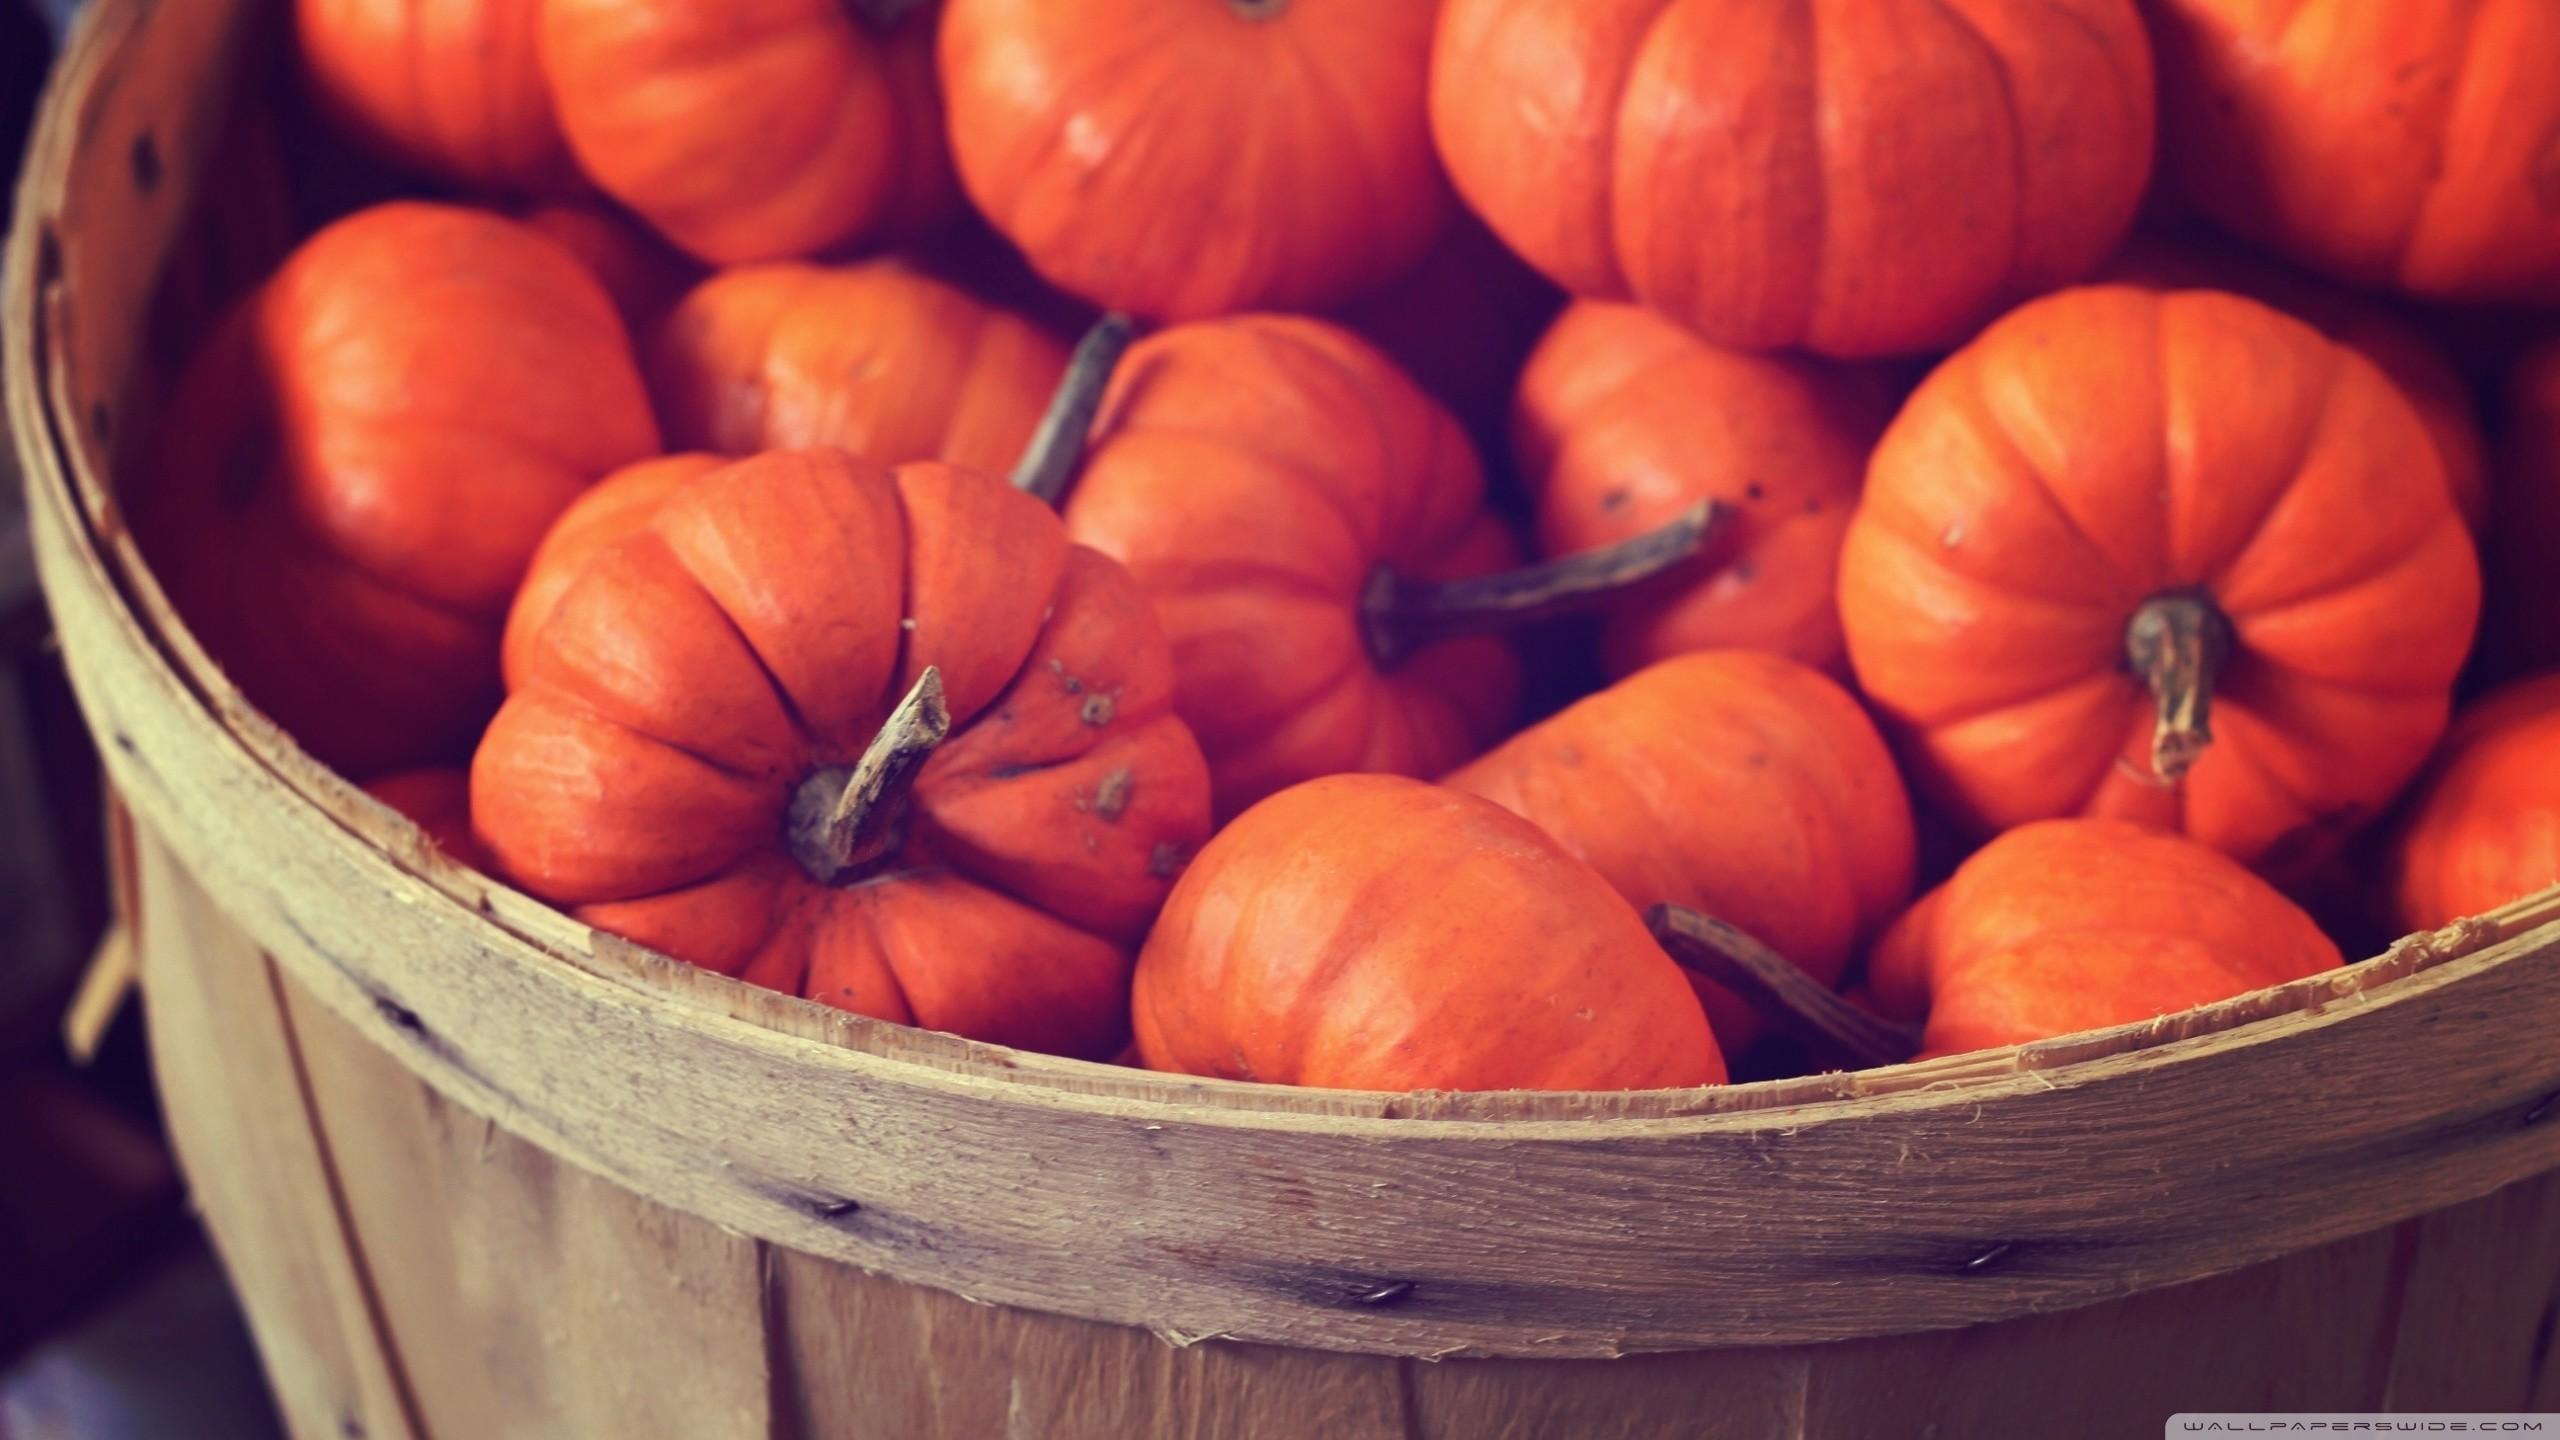 Hd Pumpkin Wallpaper 60 Pictures